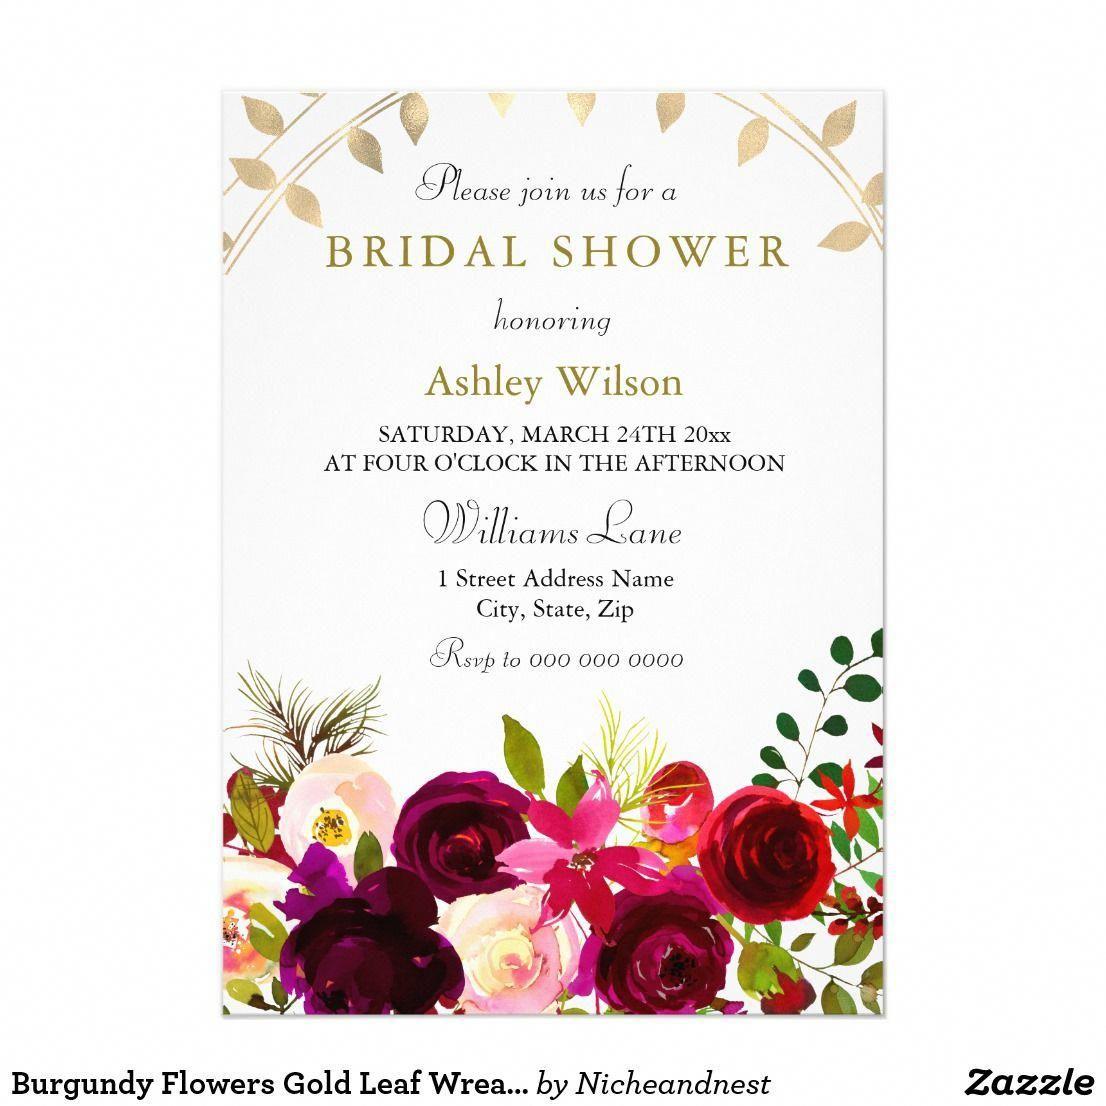 Wedding Venues Near Me Budget Floral wedding invitations